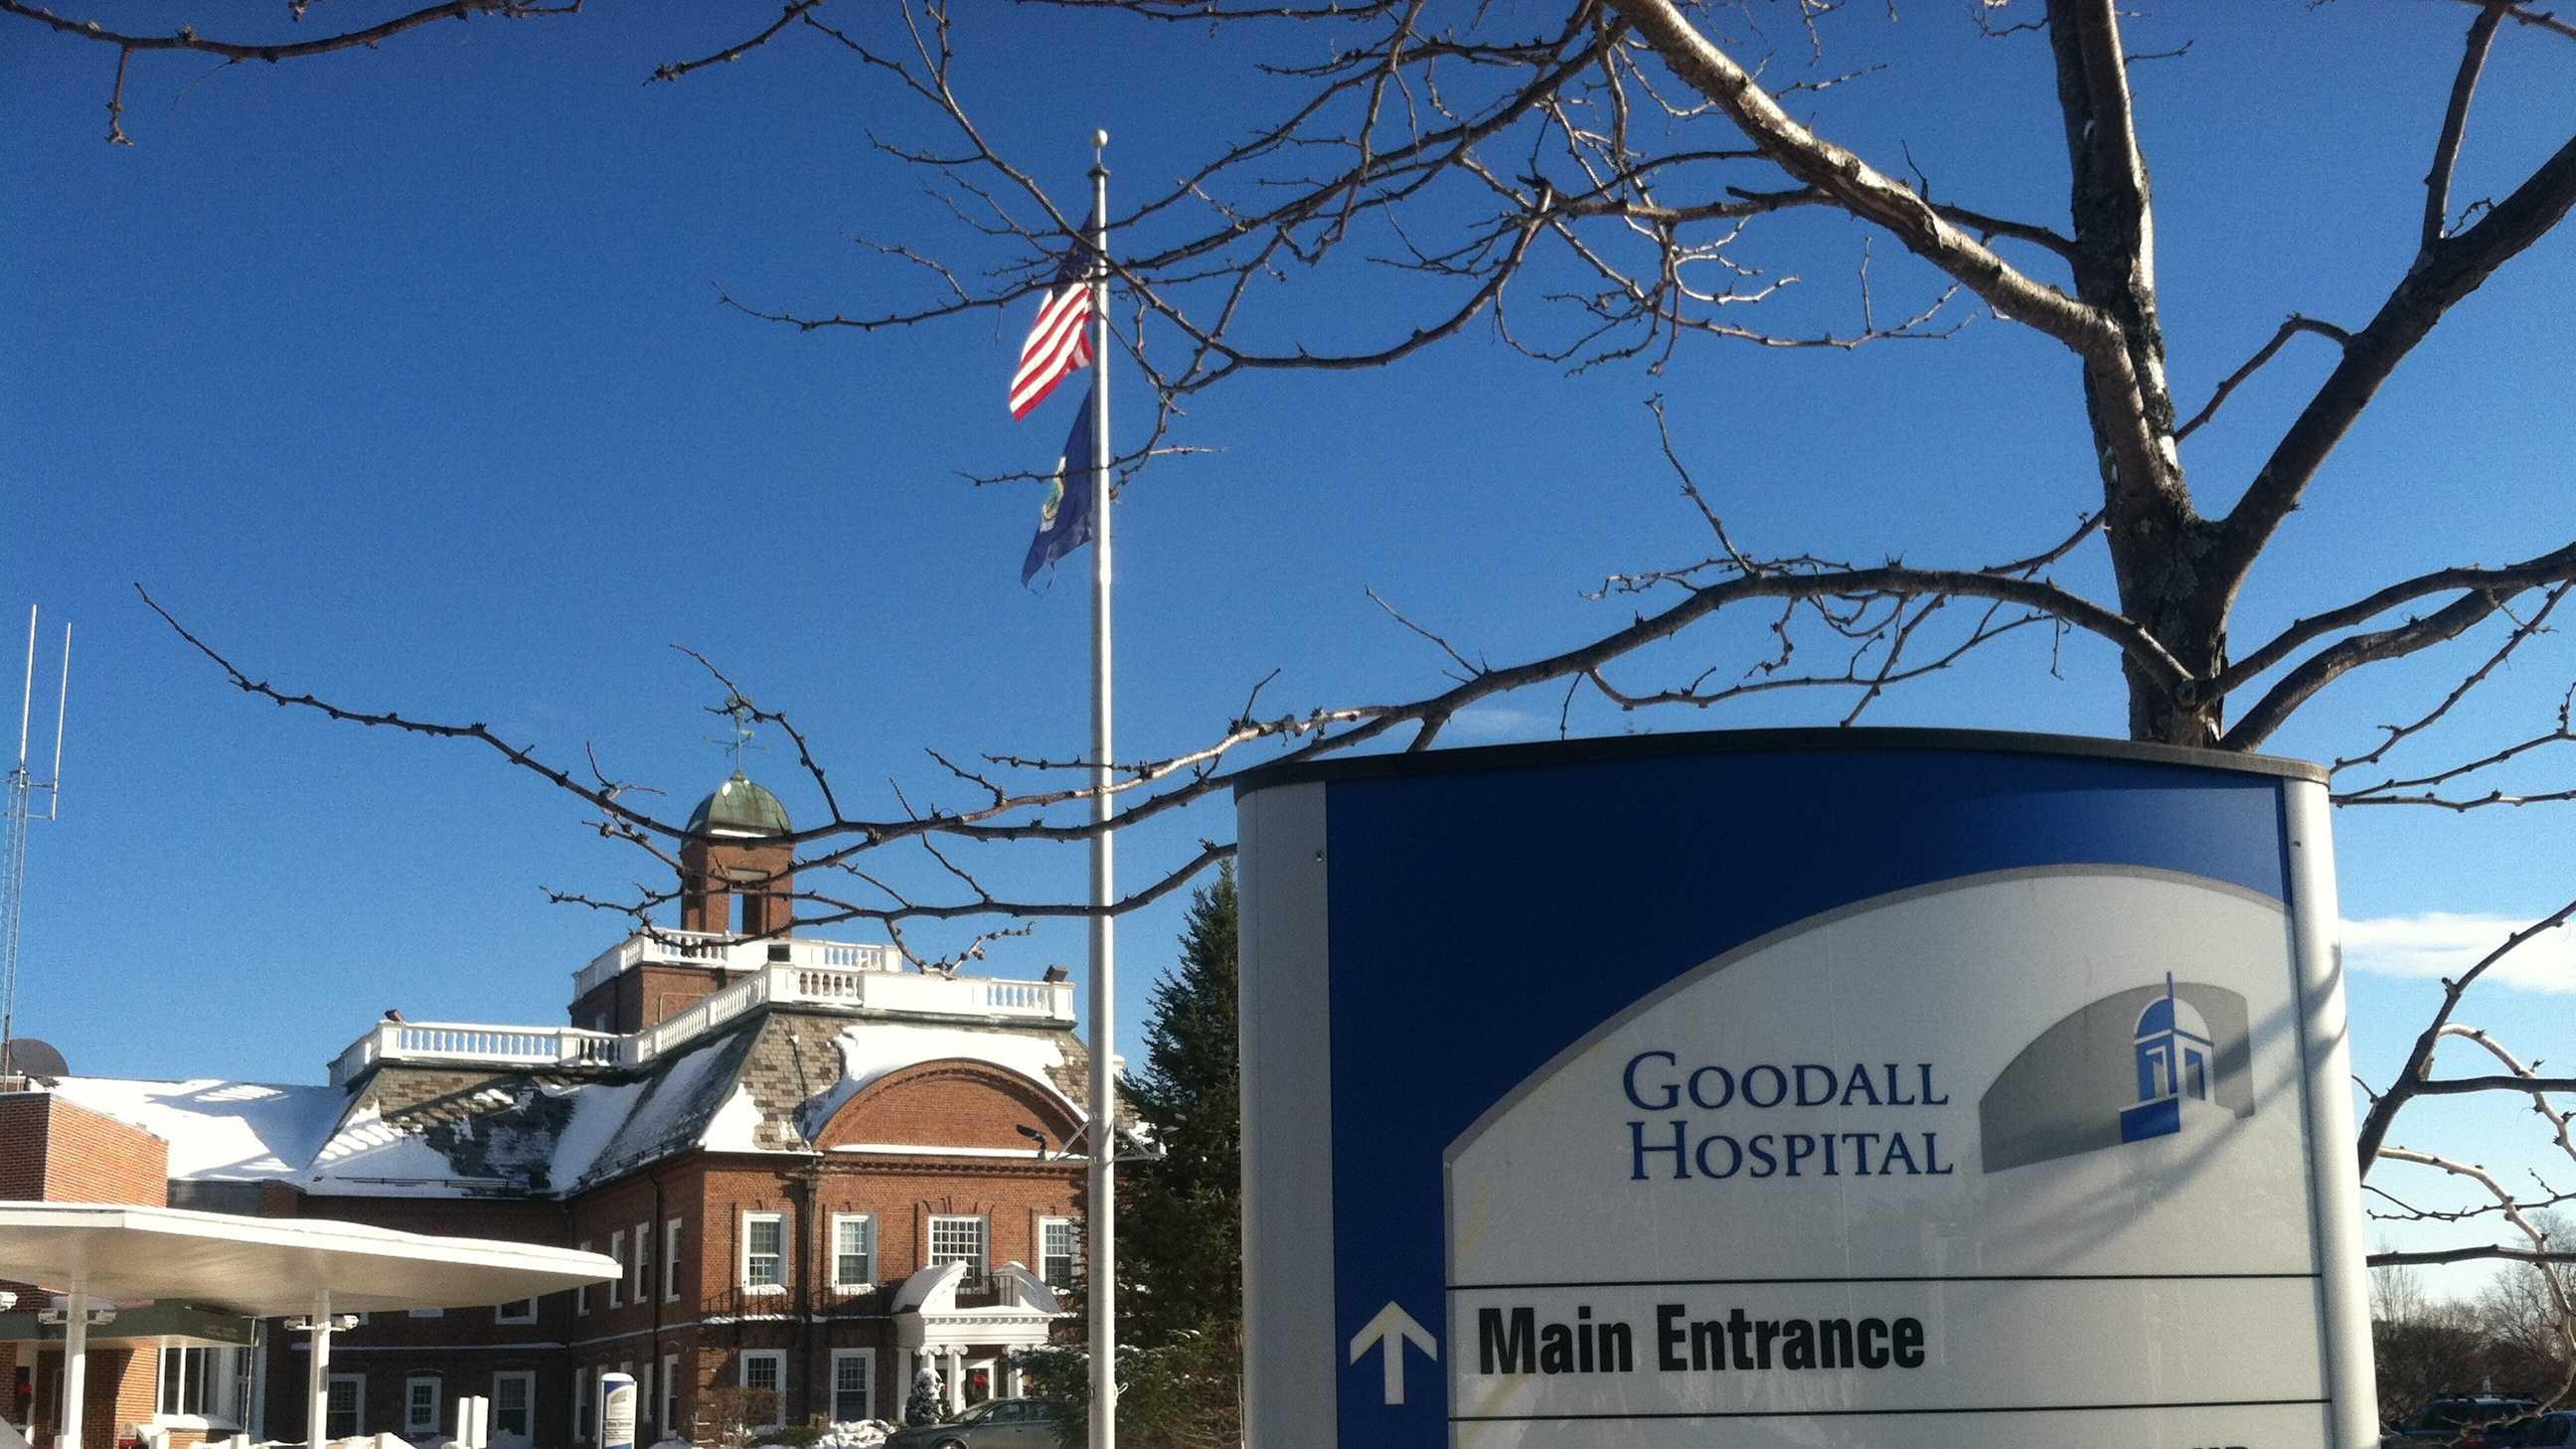 Goodall Hospital